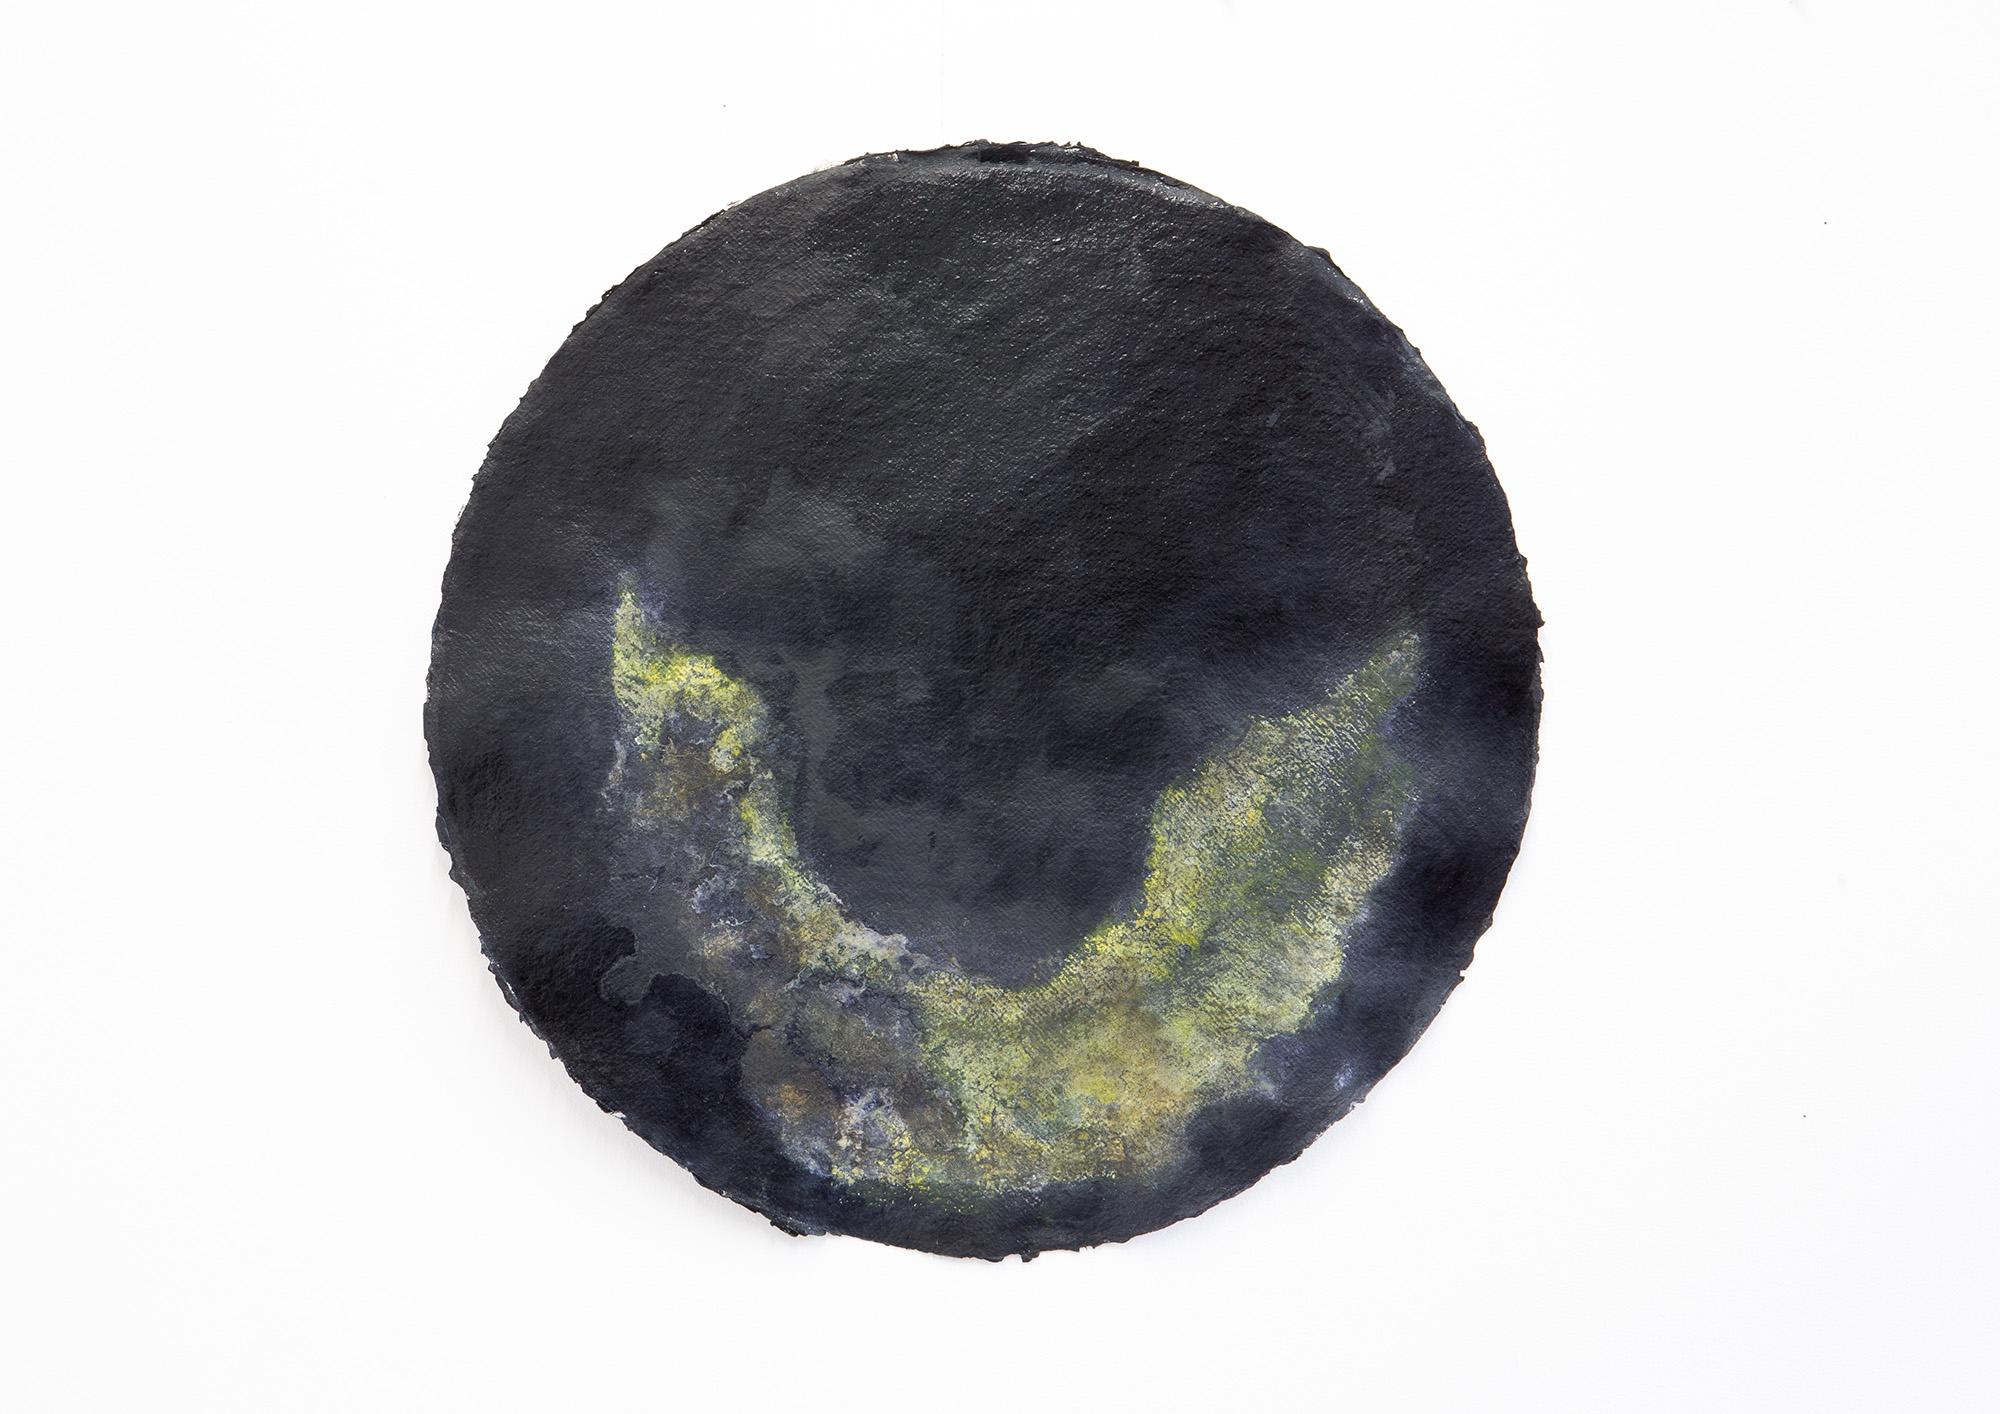 Maya Balcioglu Untitled (3 Tondos) (2021) Ink, etching ink, kaolin on paper 55 cm (Diameter) each.